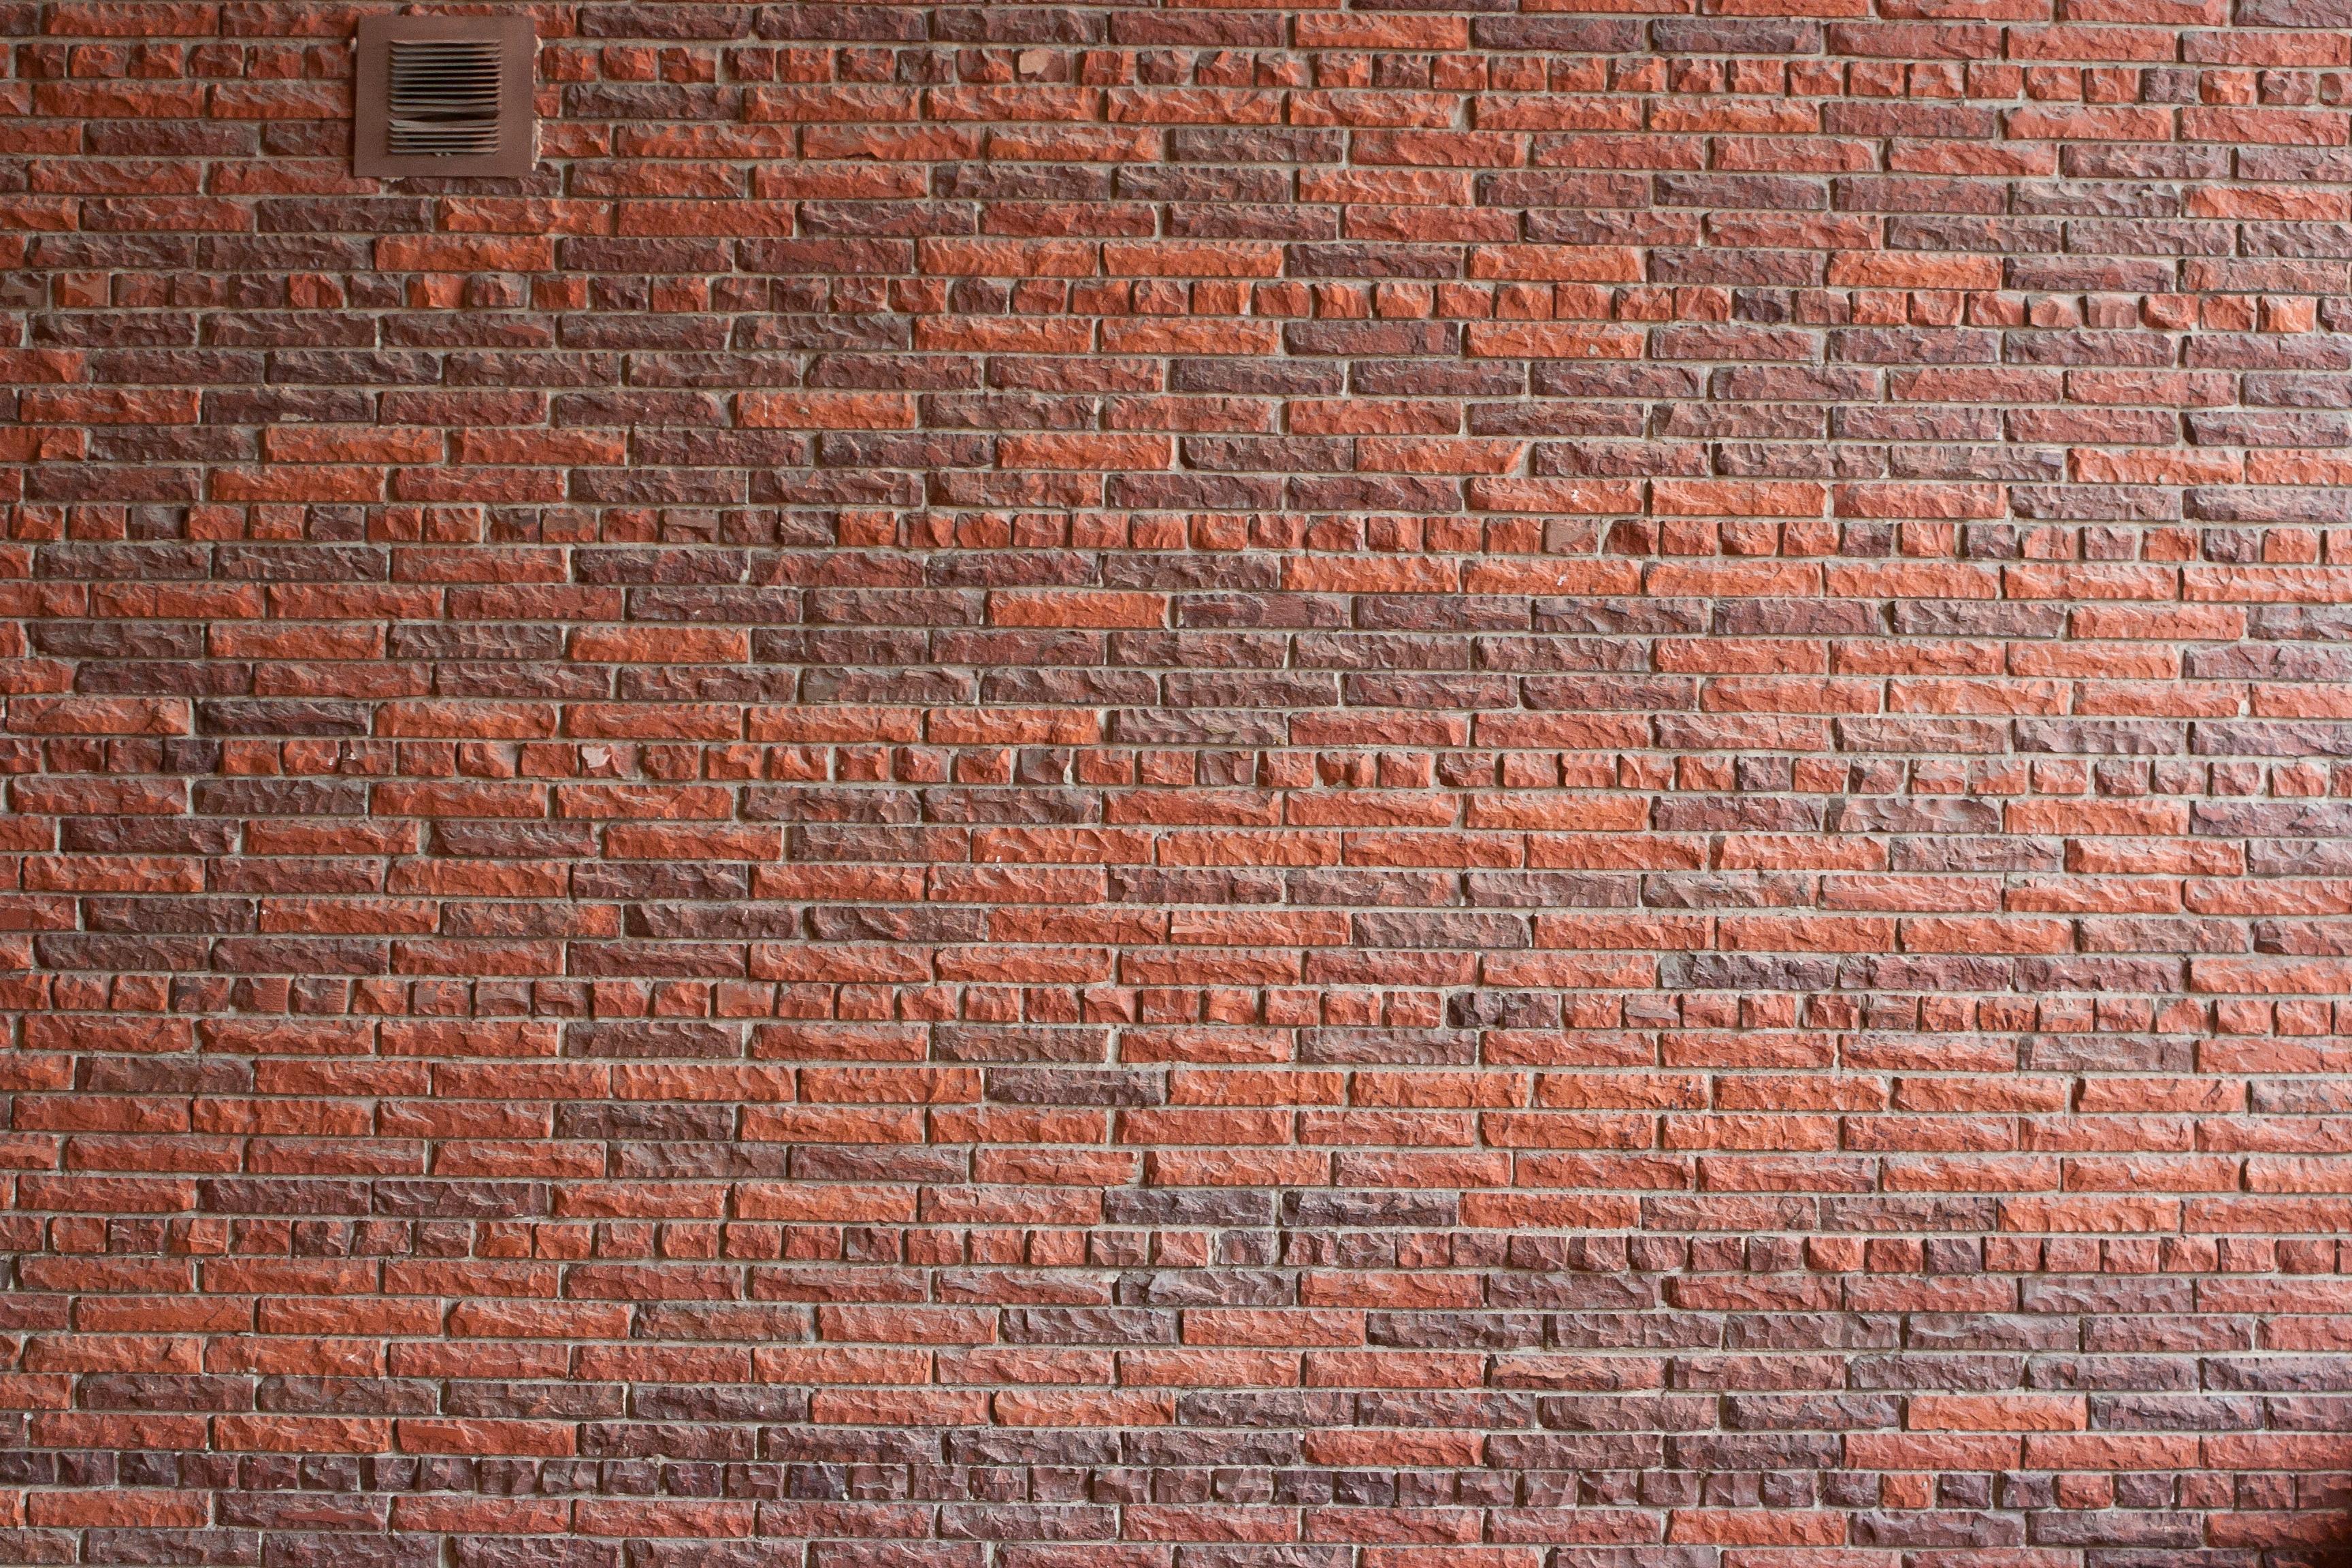 3456x2304 Graffiti Brick Wall Drawing Drawn Graffiti Brick Wall